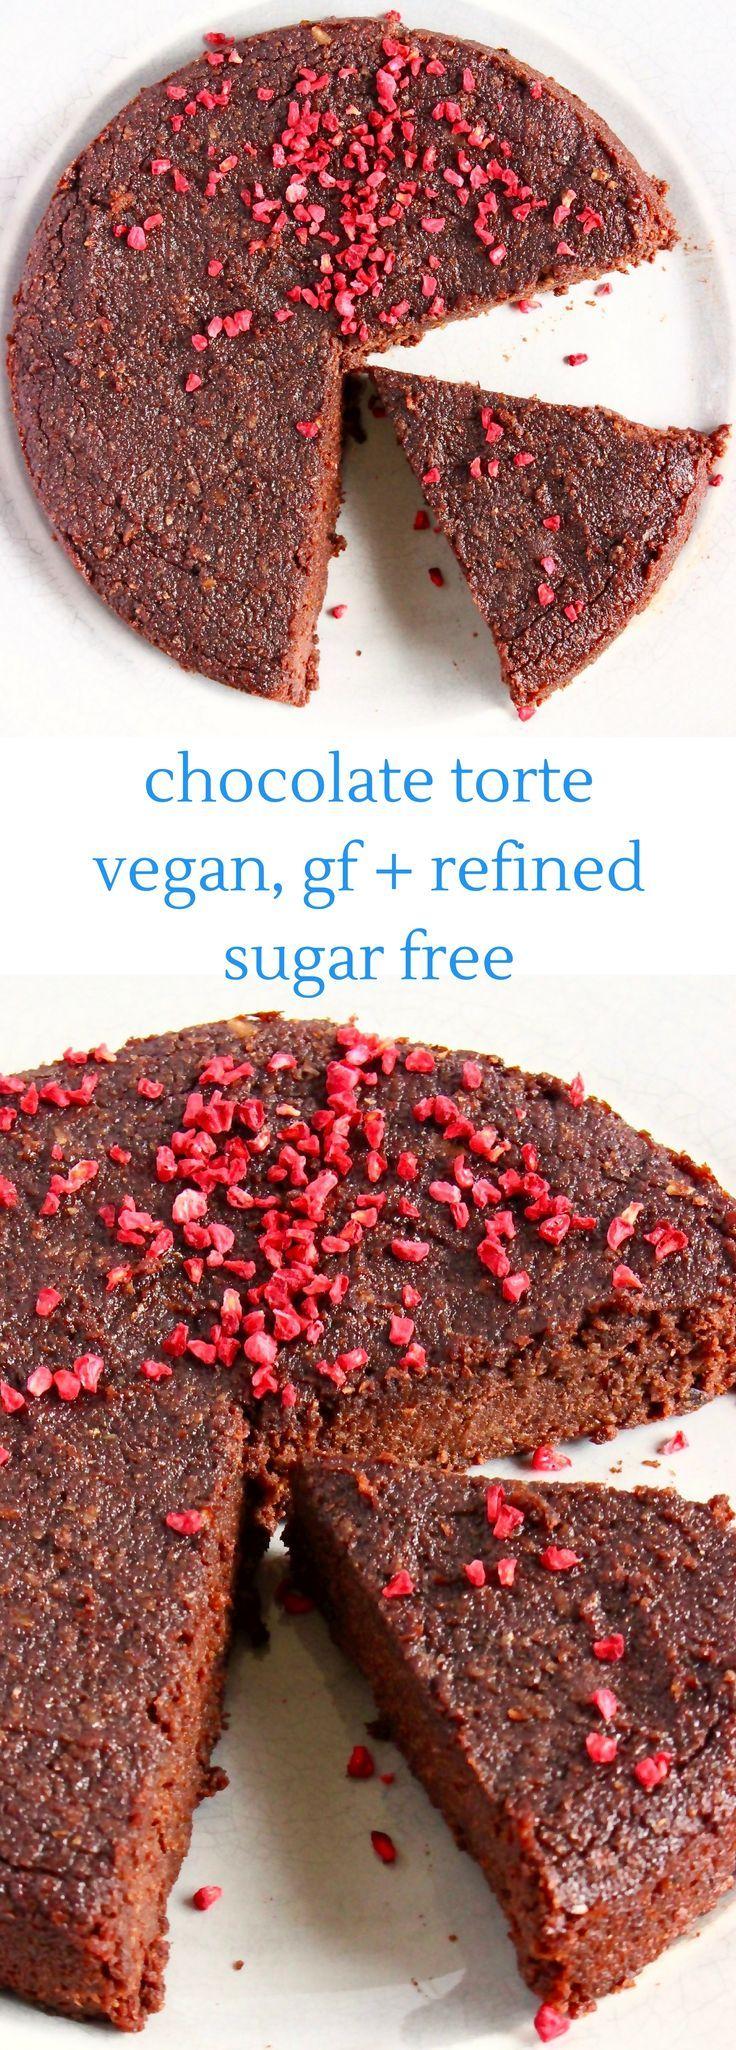 This Gluten-Free Vegan Chocolate Torte is gooey and fudgy. It requires just 6 ingredients! Oil-free optional, paleo, refined sugar free and naturally sweetened. #paleo #glutenfree #dairyfree #chocolate #cake #plantbased #refinedsugarfree #vegan #dessert